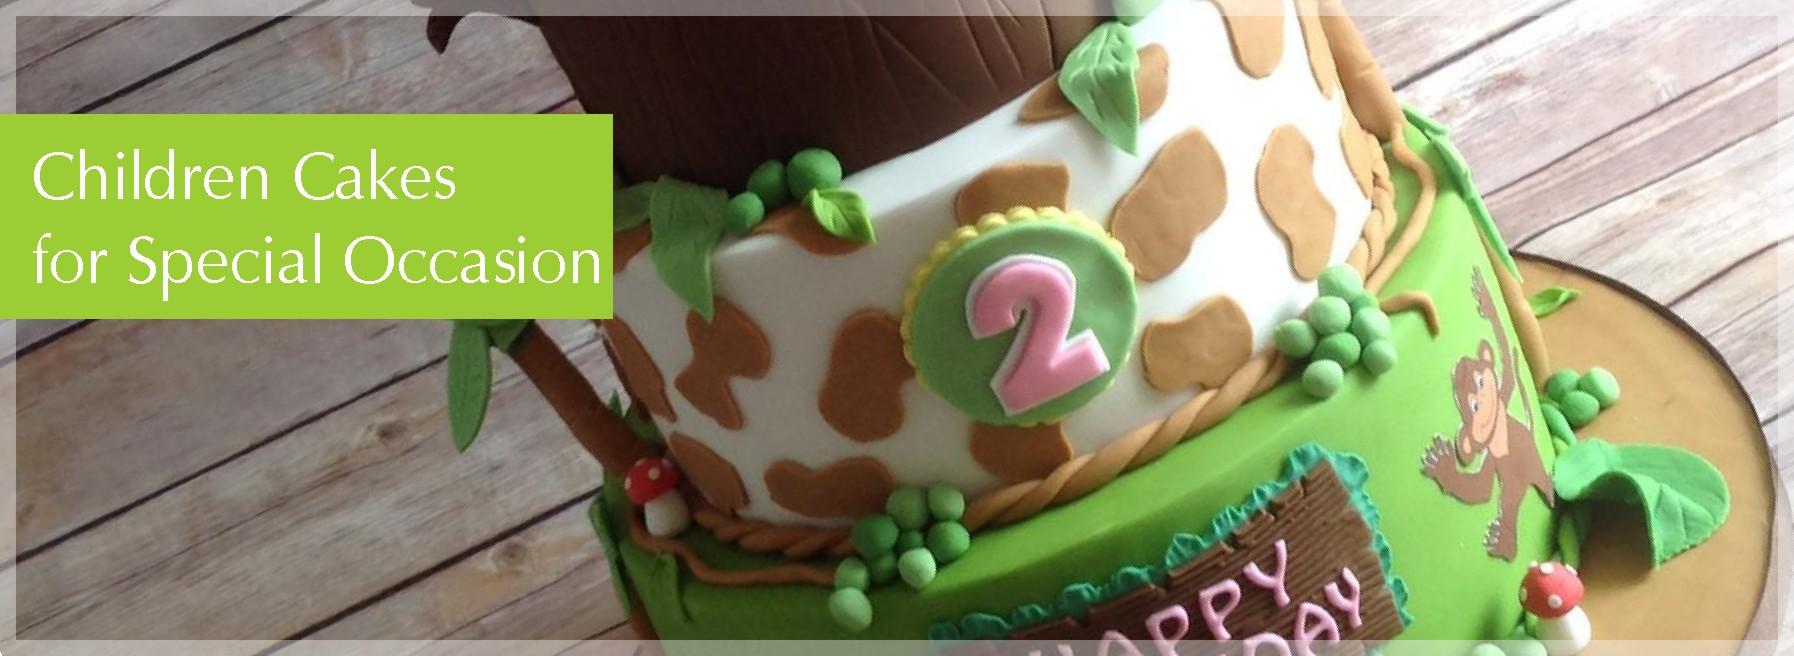 children cakes header